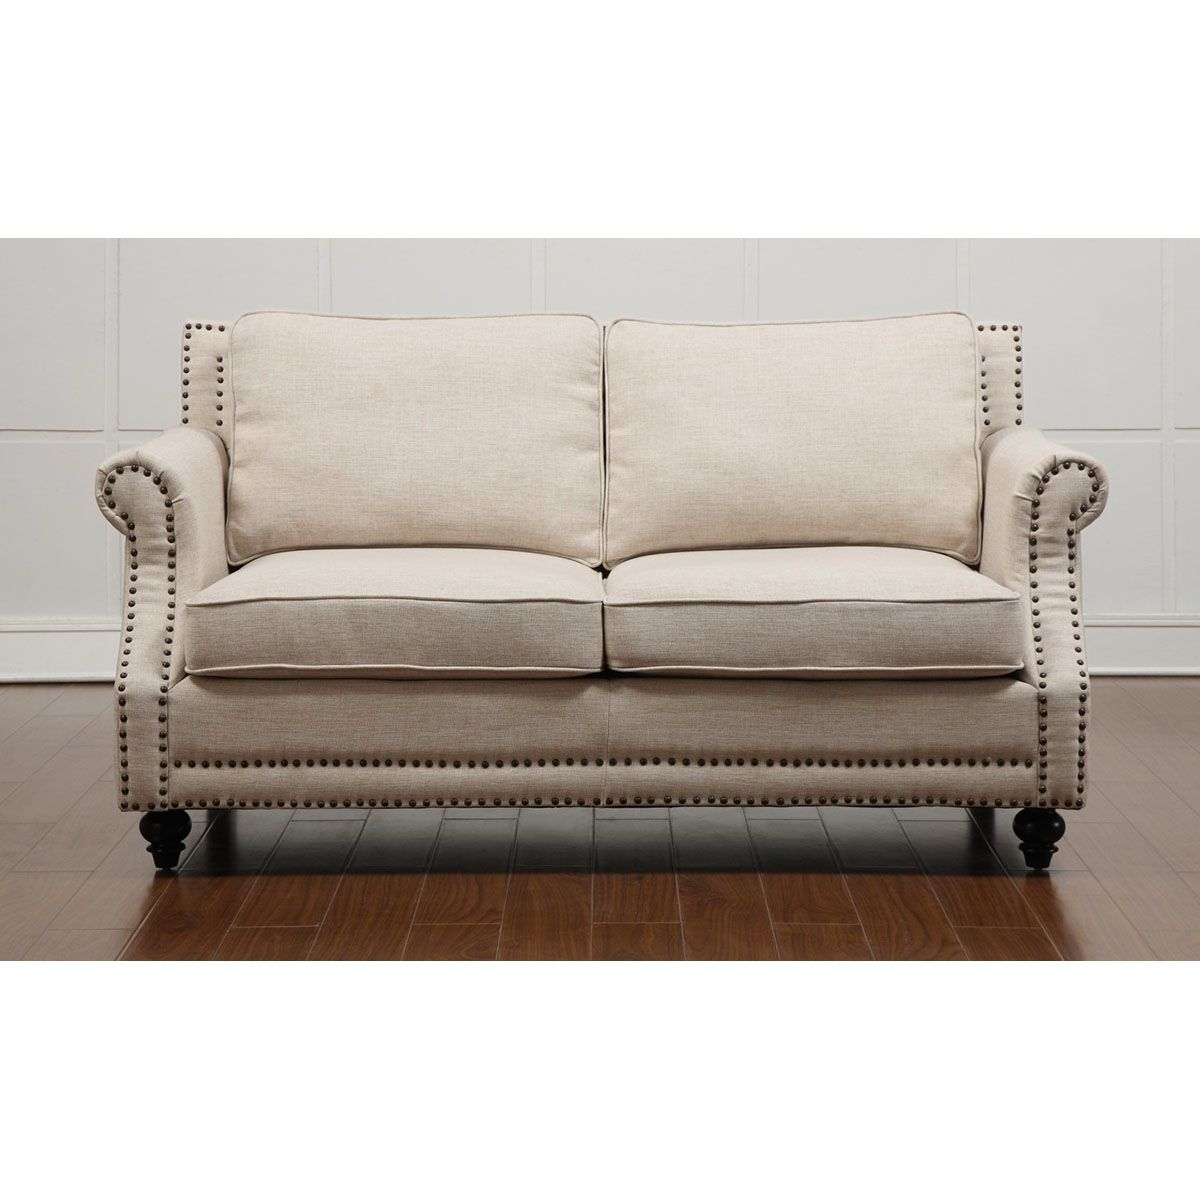 Tov Furniture Camden Beige Linen Loveseat Tov 63801 2 Beige Beige Sofa Linen Sofa Furniture